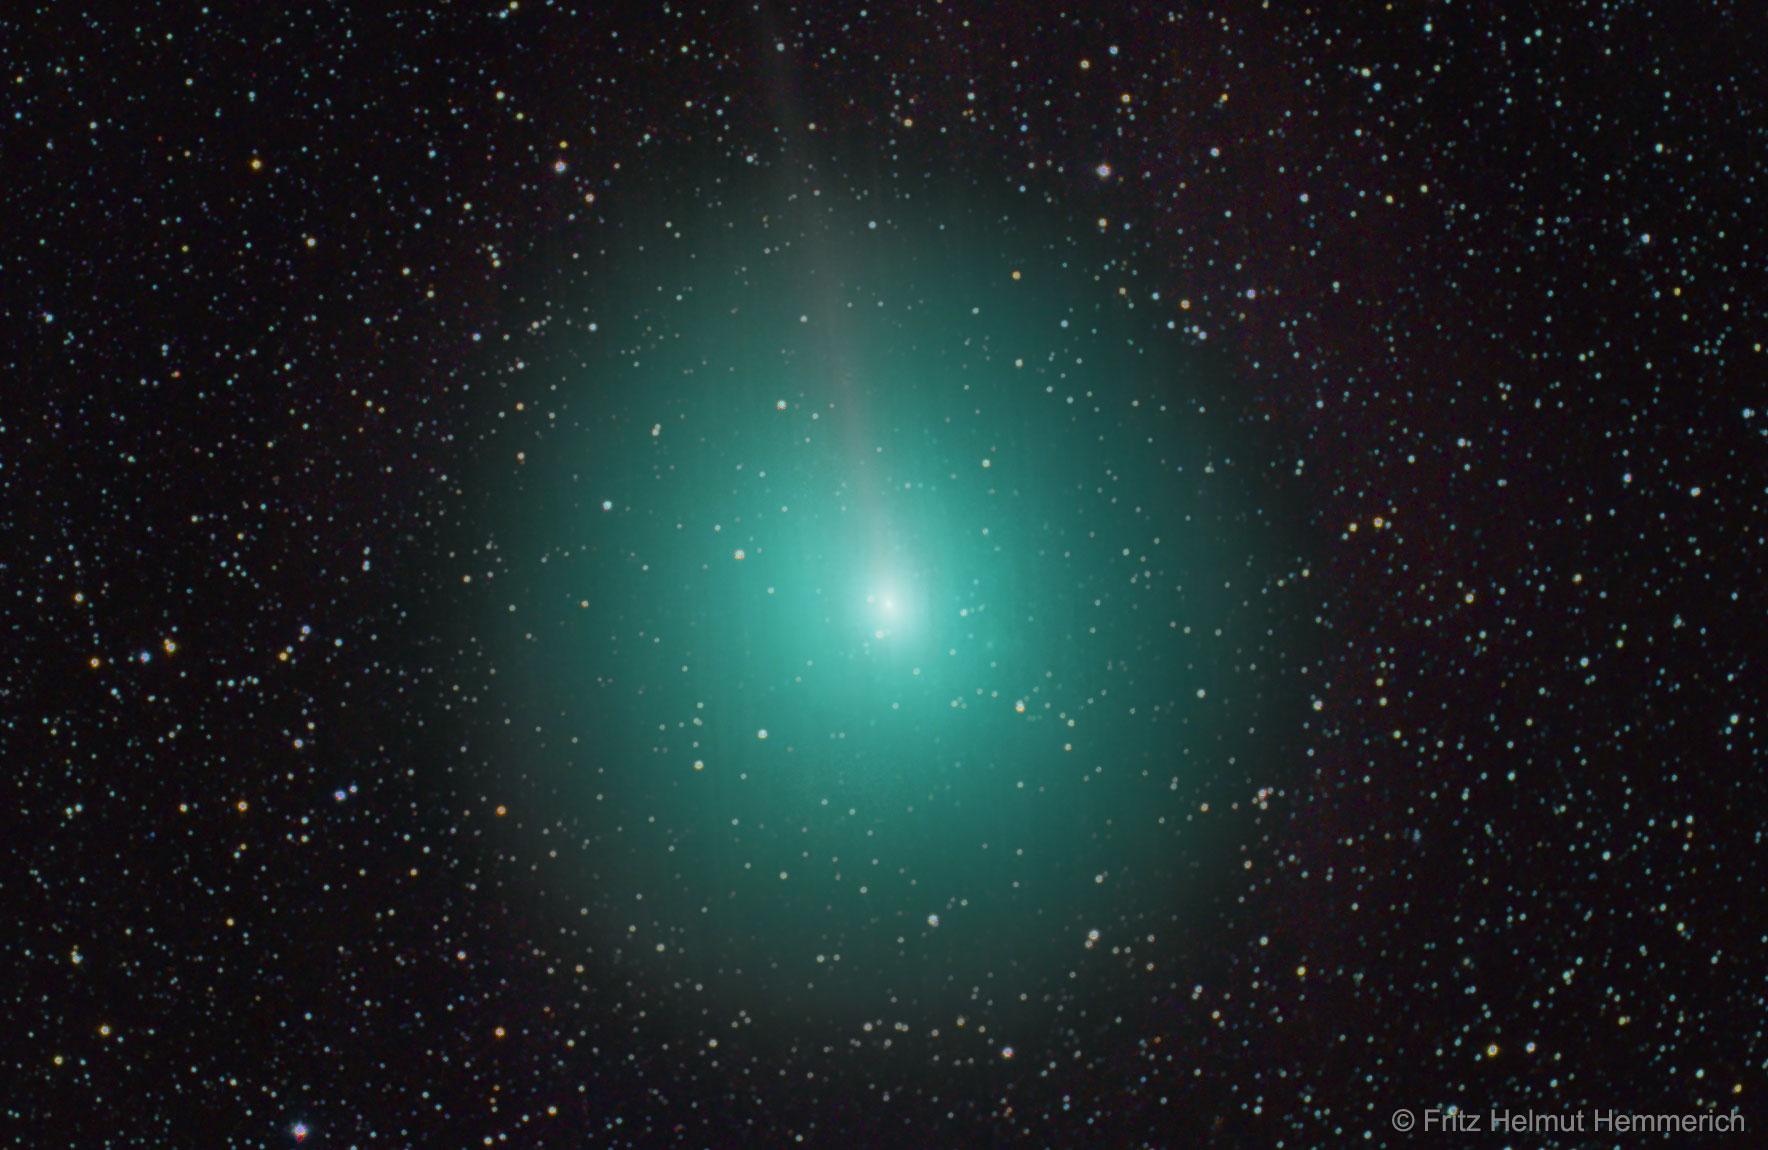 Comet45Pv2_Hemmerich_1768